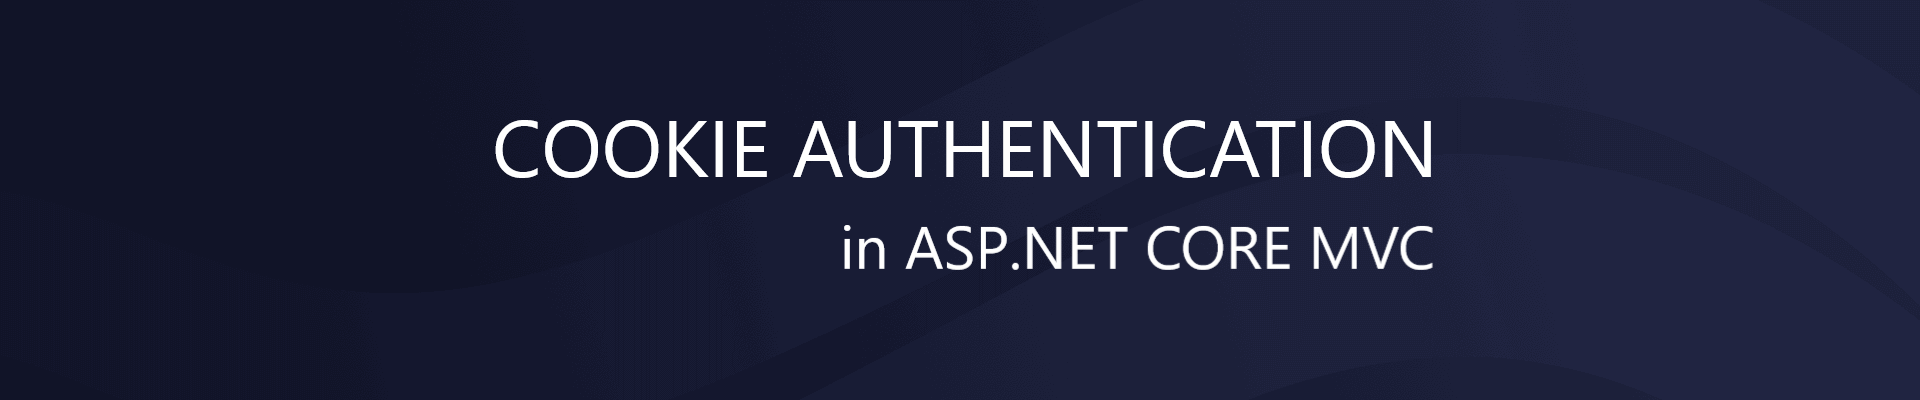 Cookie Authentication in ASP.NET CORE MVC Web Application